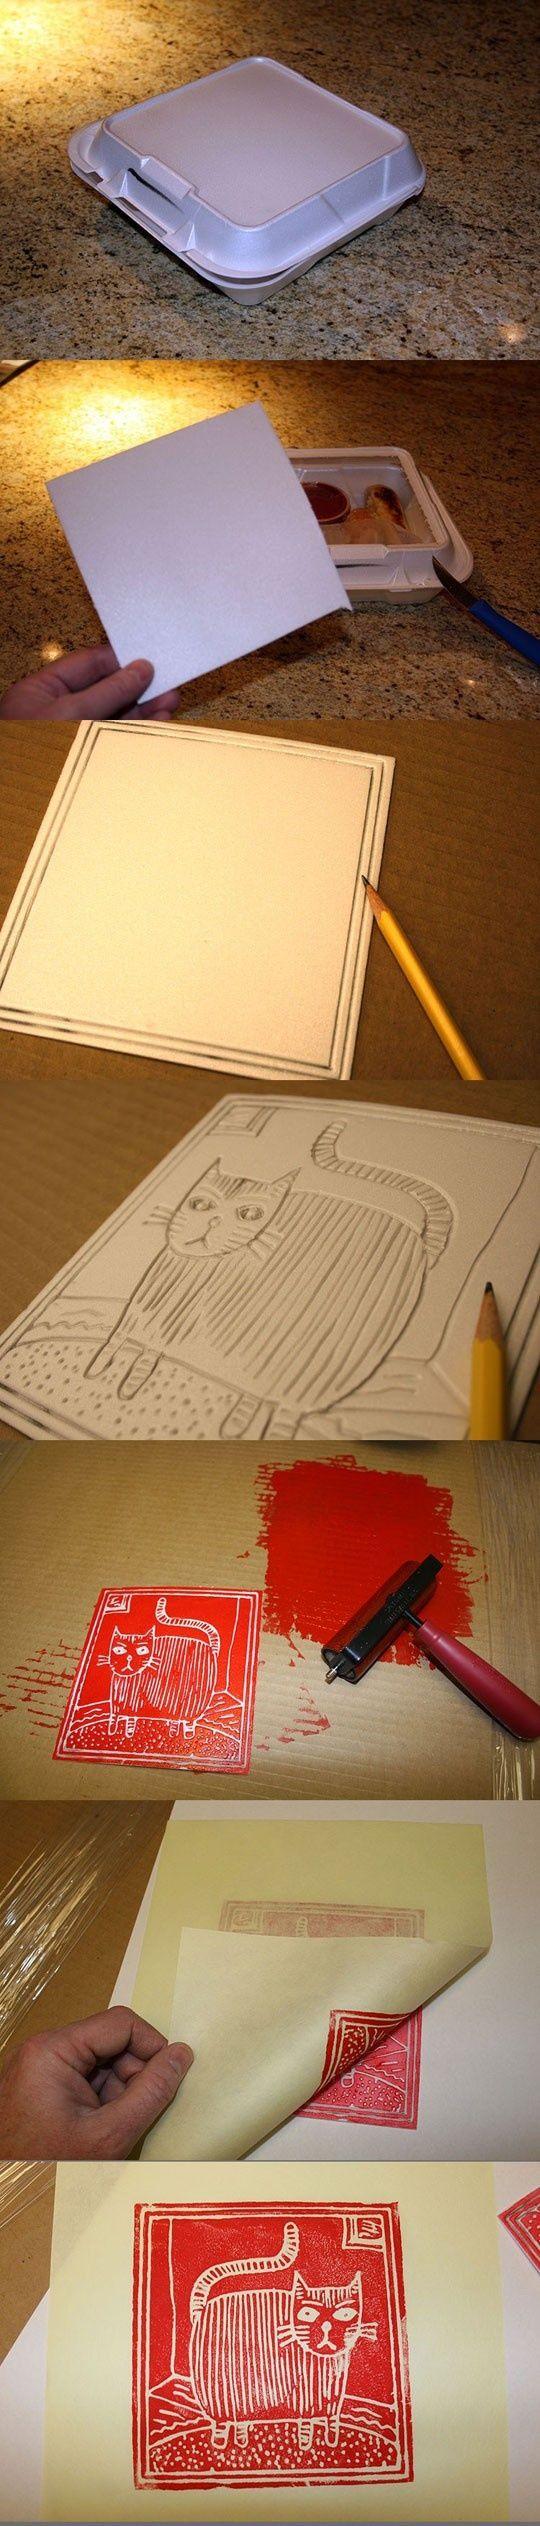 using styrofoam as linotile for printing